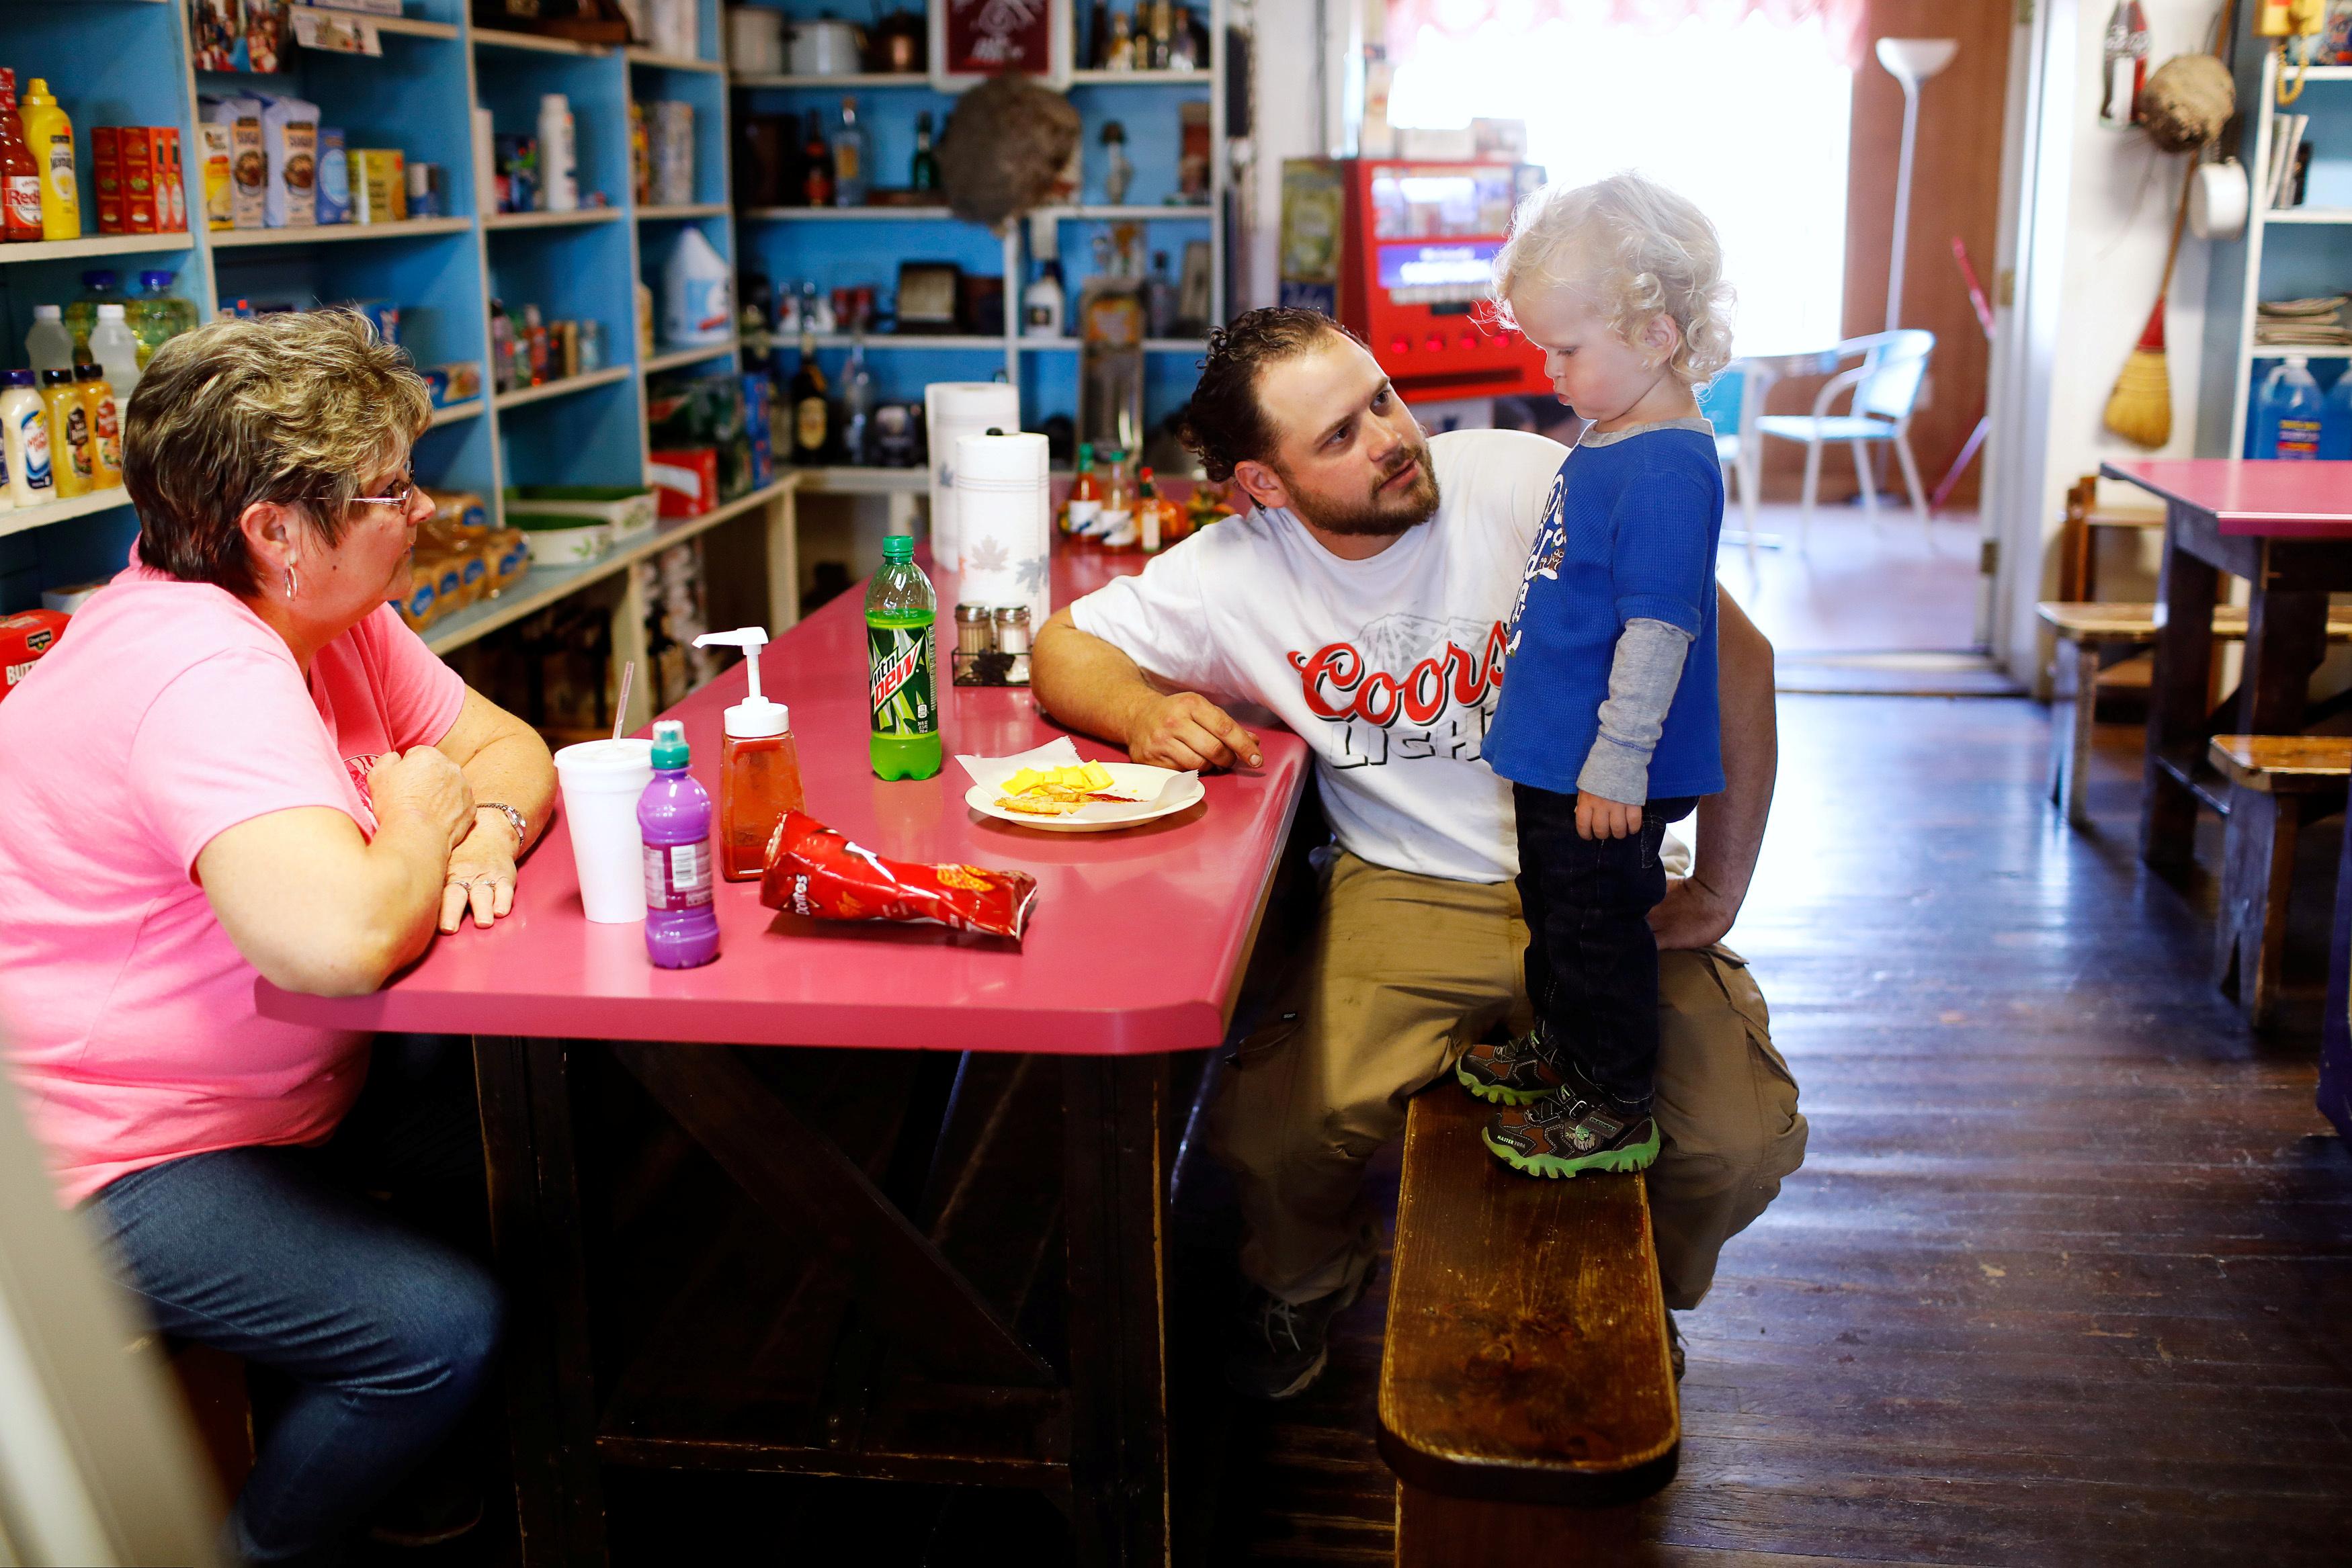 Employee Joyce Chandler looks on as Antonin Bohac encourages his son, Sawyer, to eat in Bixby